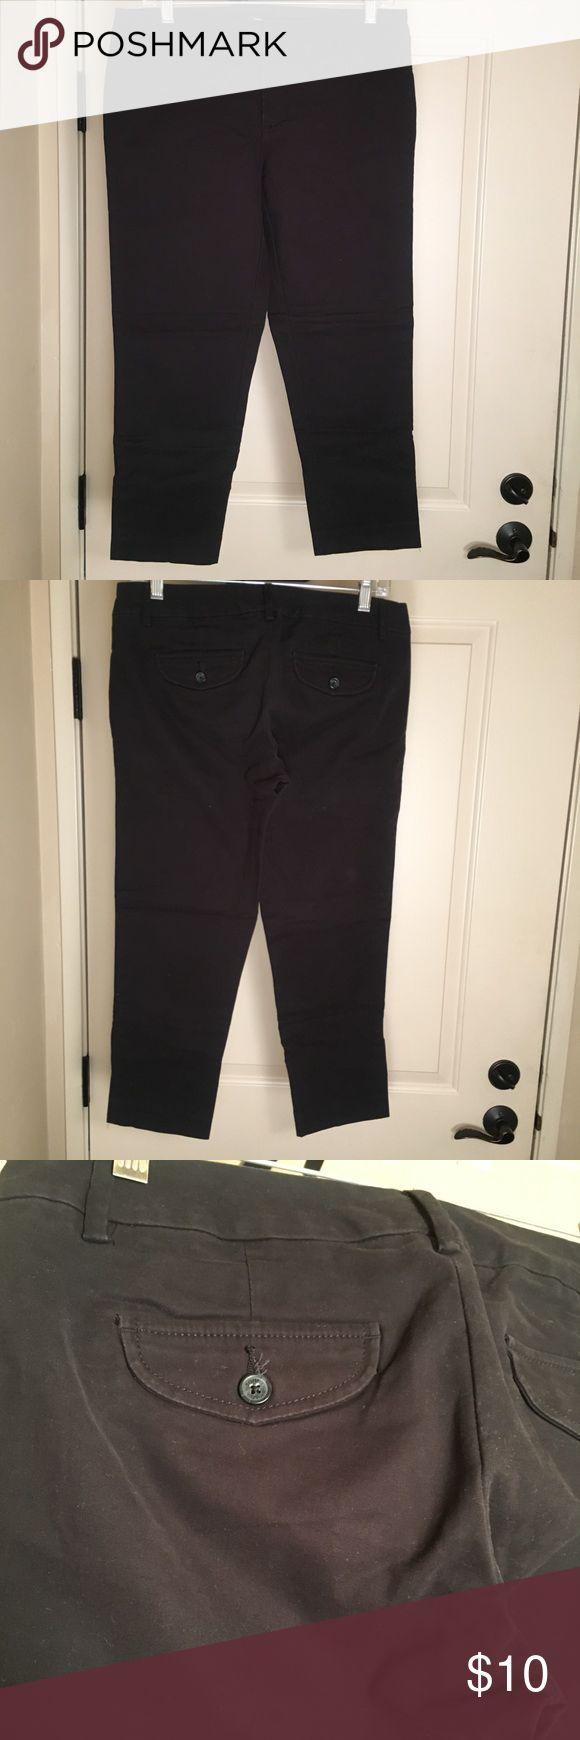 Black Tommy Hilfiger Capri dress pants Black Tommy Hilfiger Capri dress pants. Awesome staple pair of pants. Great condition. Tommy Hilfiger Pants Ankle & Cropped